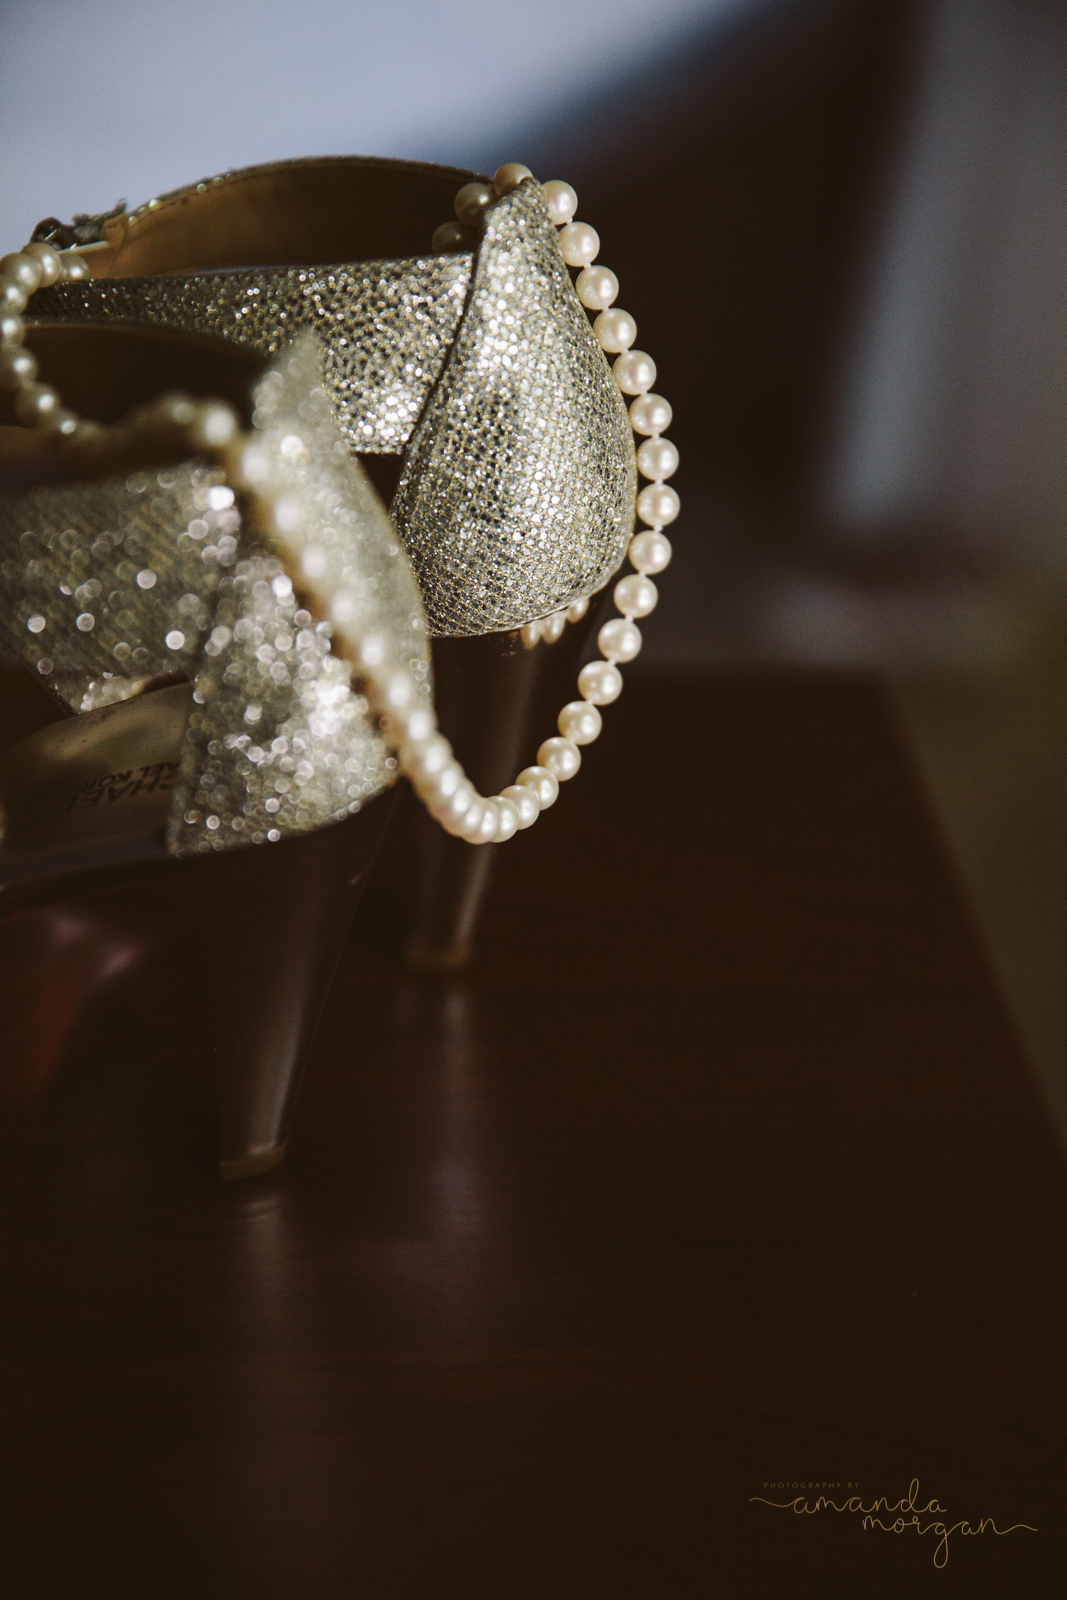 Publick-House-Wedding-Amanda-Morgan-5.jpg